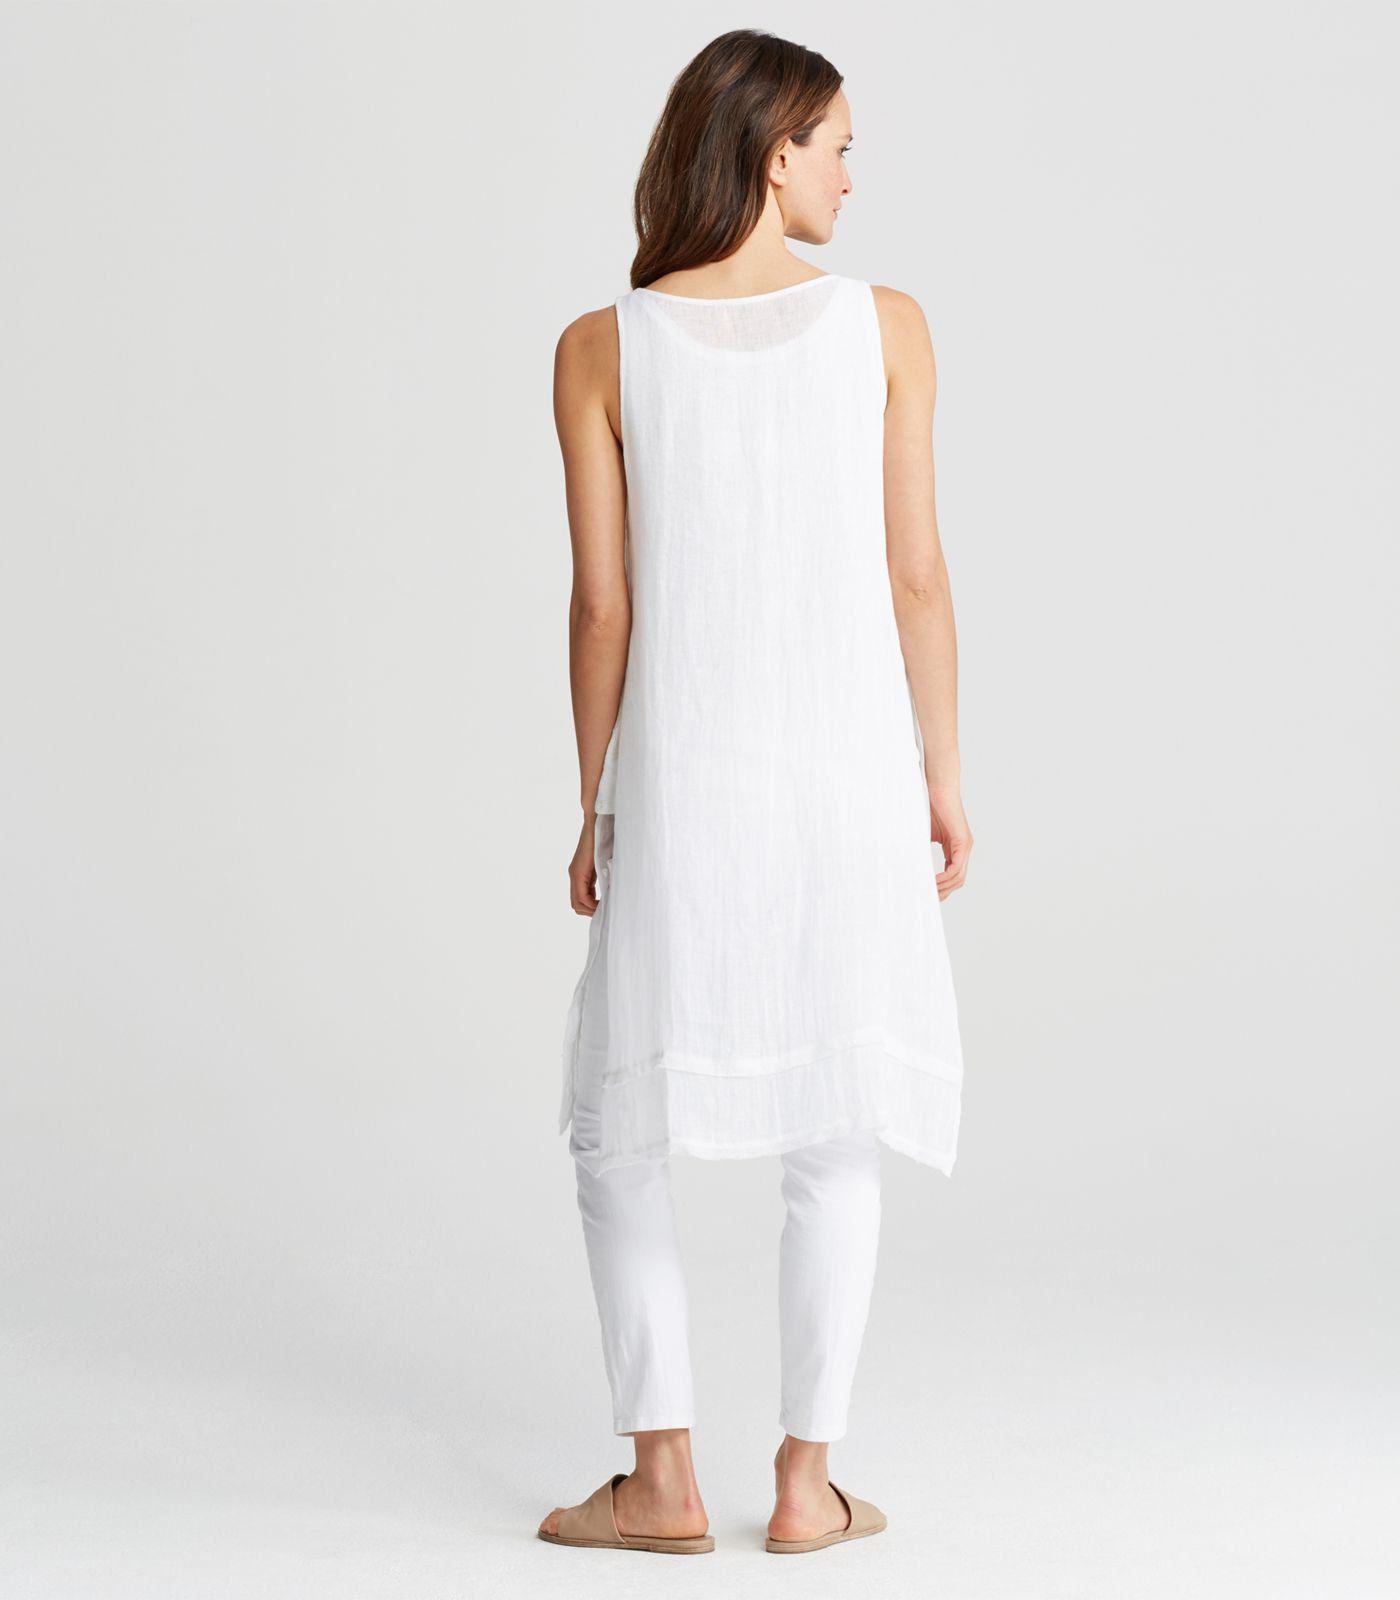 63e33e841f0 Eileen Fisher Organic Linen Gauze Bateau Neck Sleeveless Tunic in ...